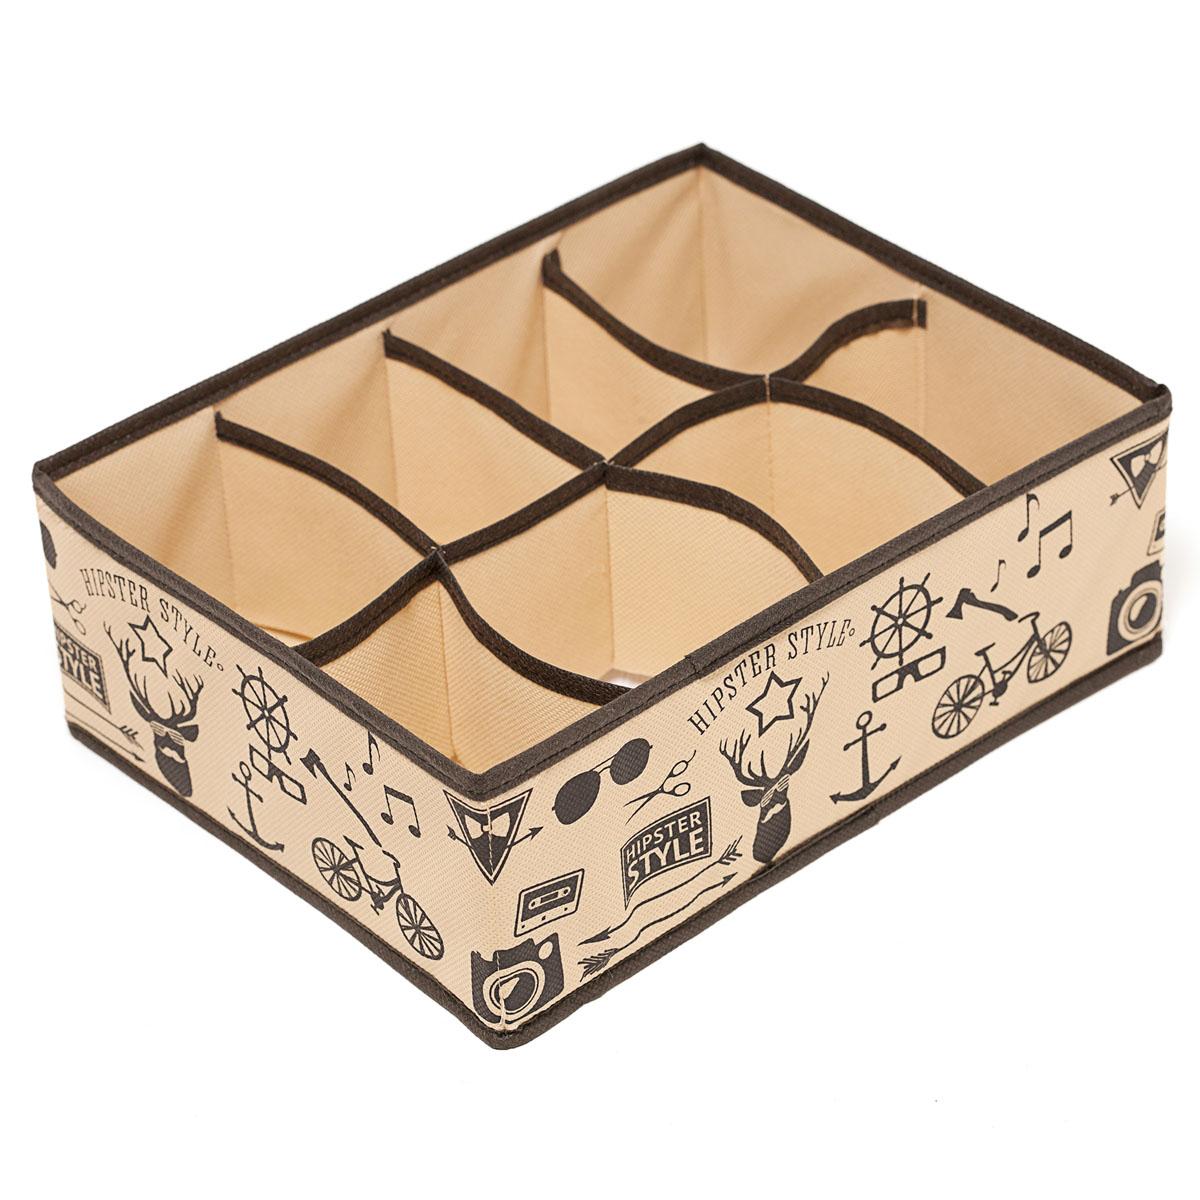 Органайзер для хранения вещей Homsu Hipster Style, 8 секций, 31 х 24 х 11 см набор органайзеров homsu ностальгия с крышкой 31 х 24 х 11 см 3 шт